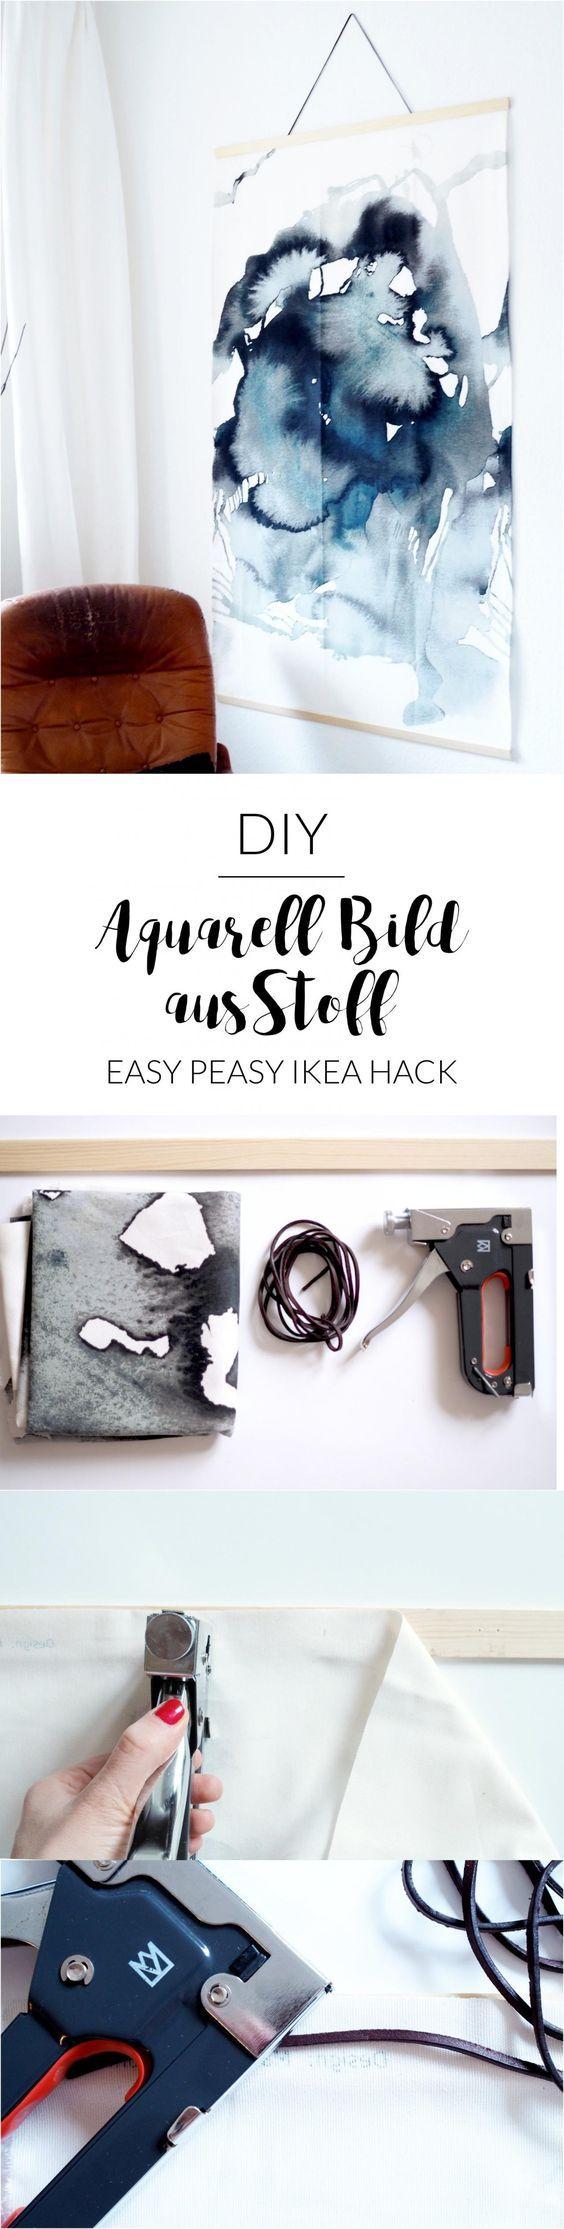 IKEA Hack: DIY-Aquarell-Bild im Großformat | Wall Hanging | selbstgemacht | Wandbild Großformat aus Stoff | | Bild selber machen | Kunst | Aquarell Bild gestalten | Anleitung | Tutorial | Skandinavisch wohnen | skandinavisch einrichten | kreativ wohnen | kreativ einrichten | paulsvera